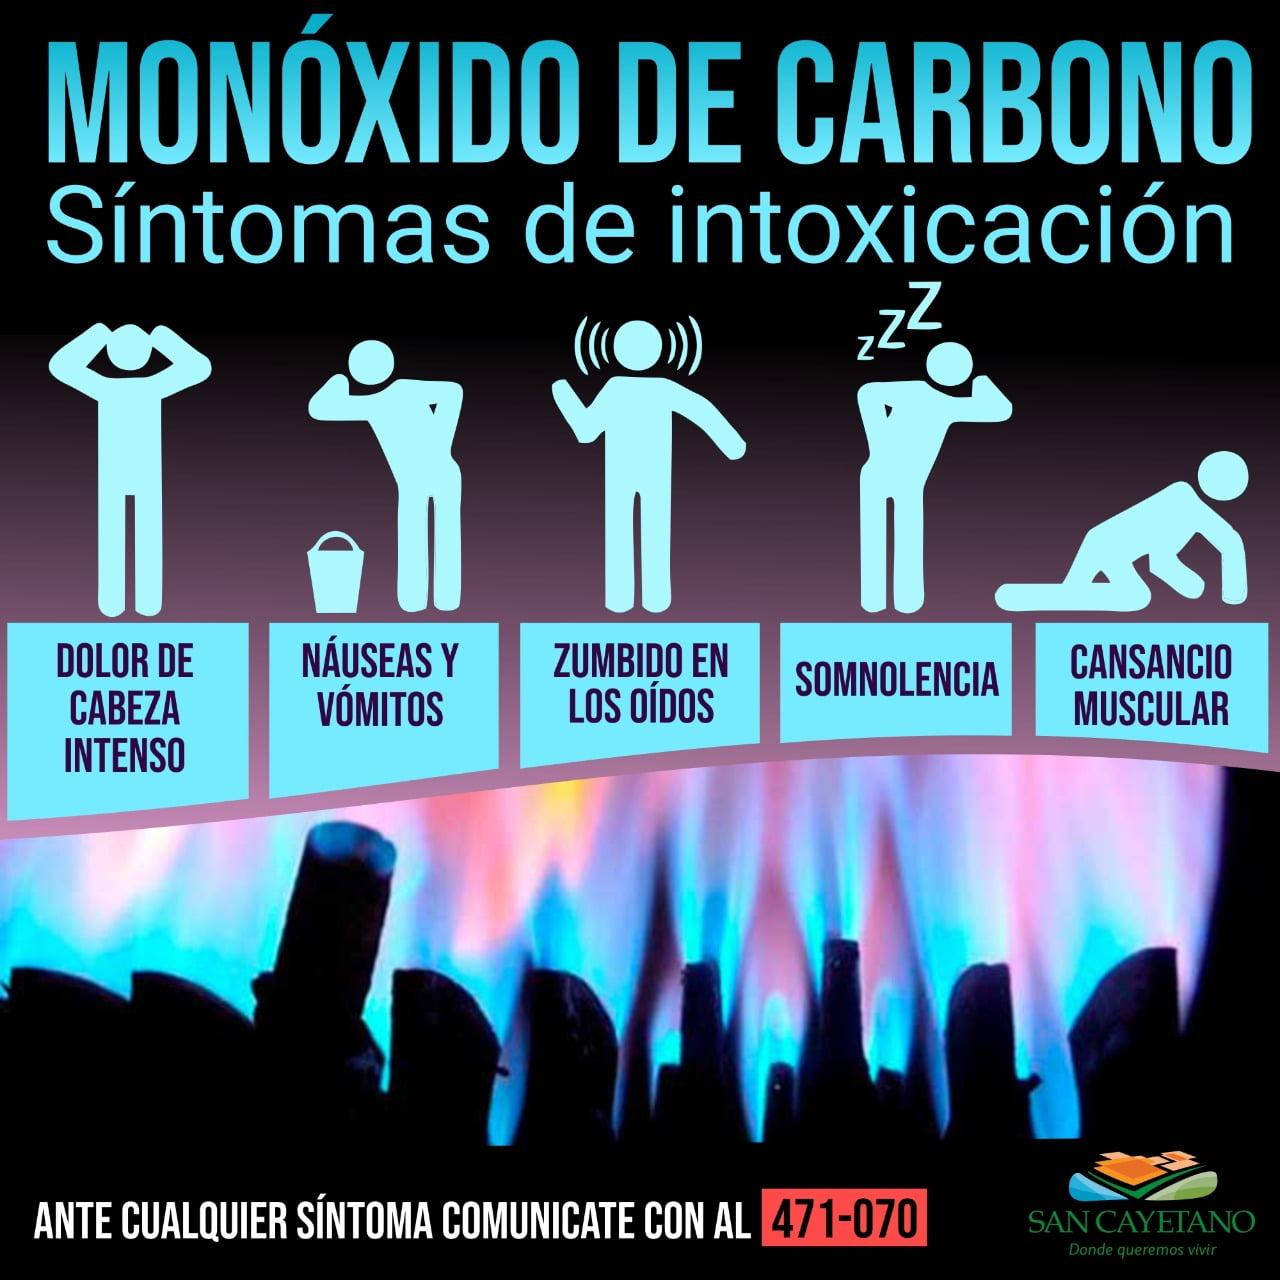 Recomendaciones para evitar intoxicación con monóxido de carbono